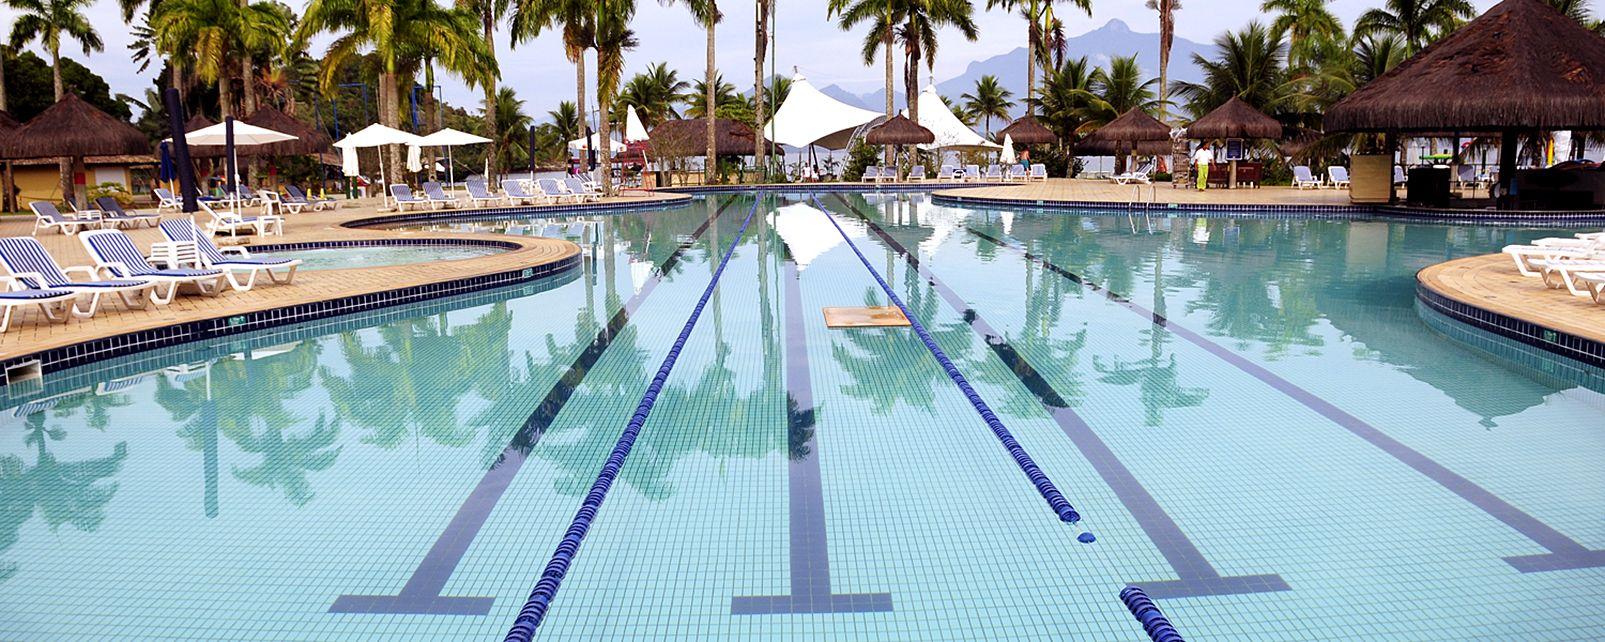 Hotel Eco Resort Angra Hotel